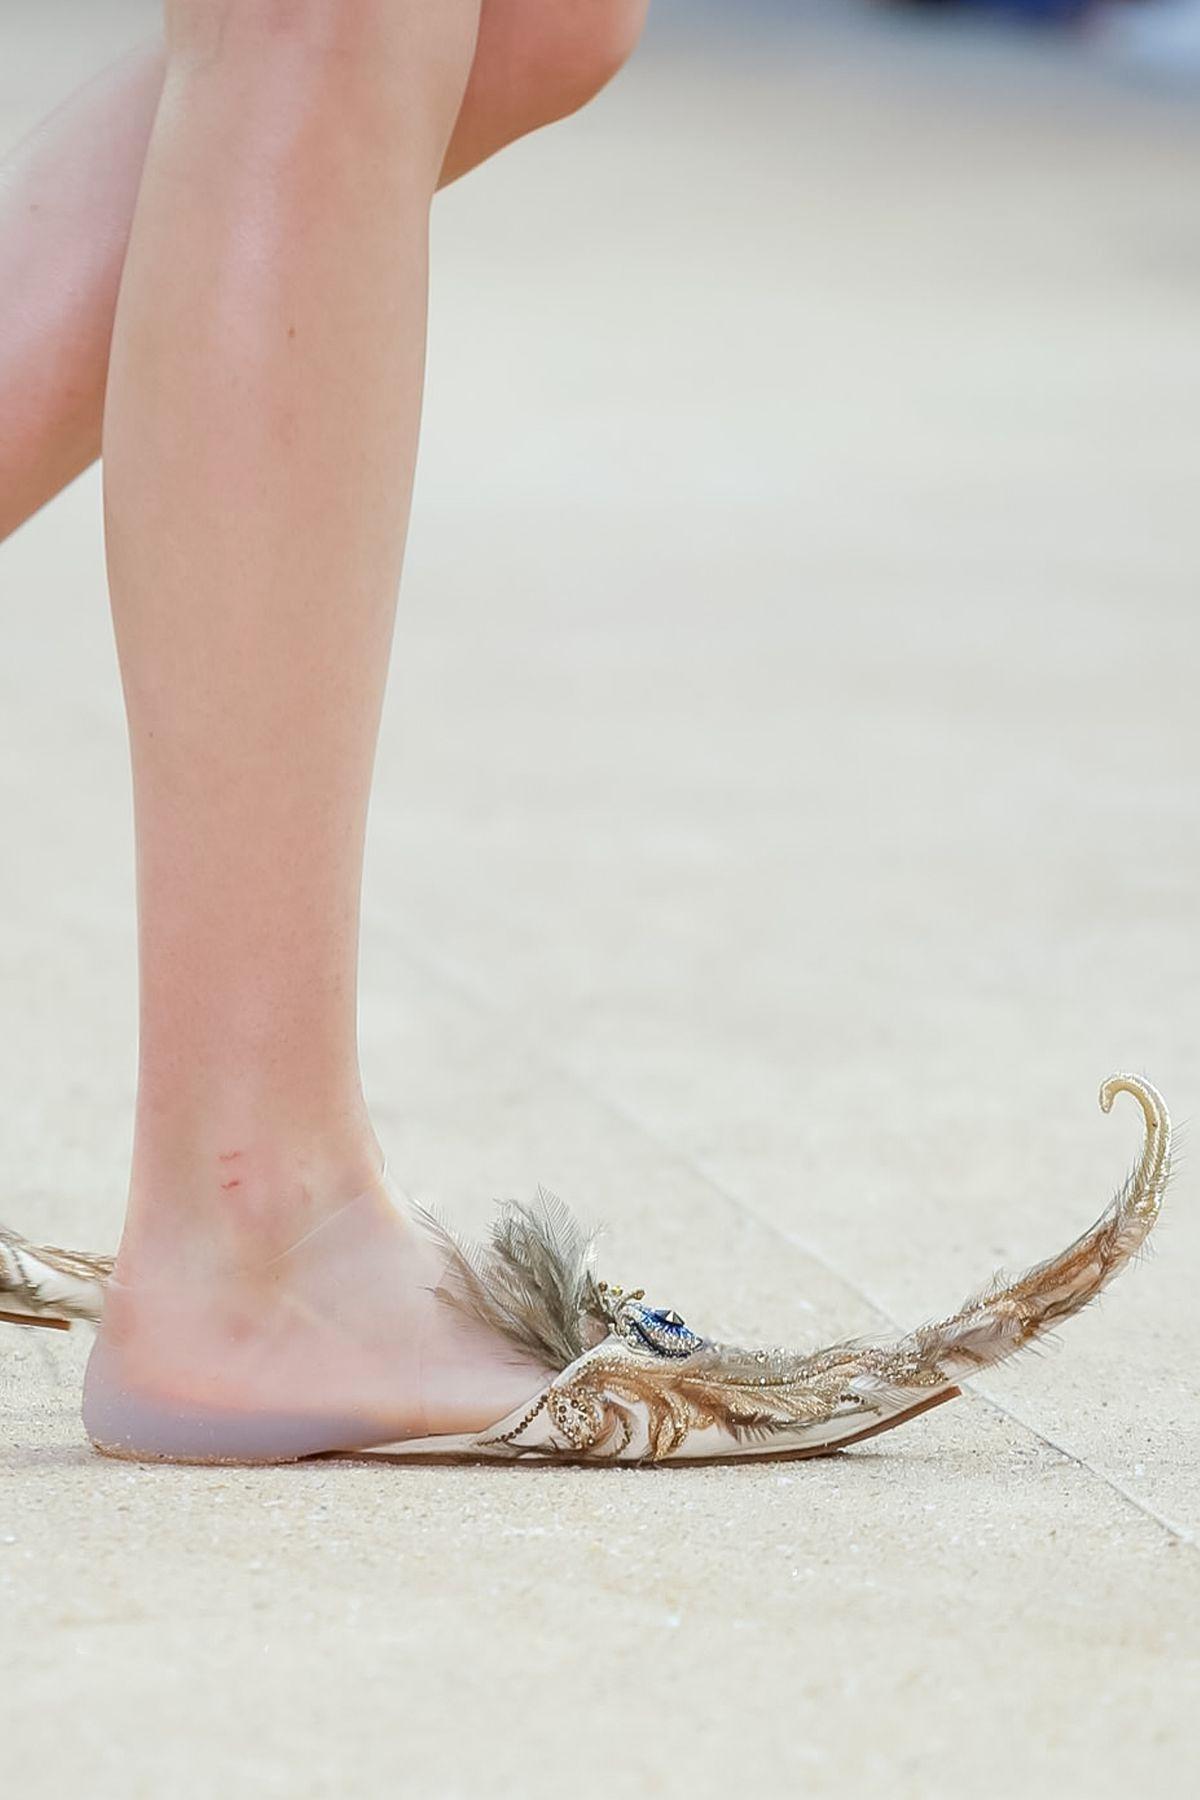 Обувь из коллекции Guo Pei Fall/Winter 2019 Couture